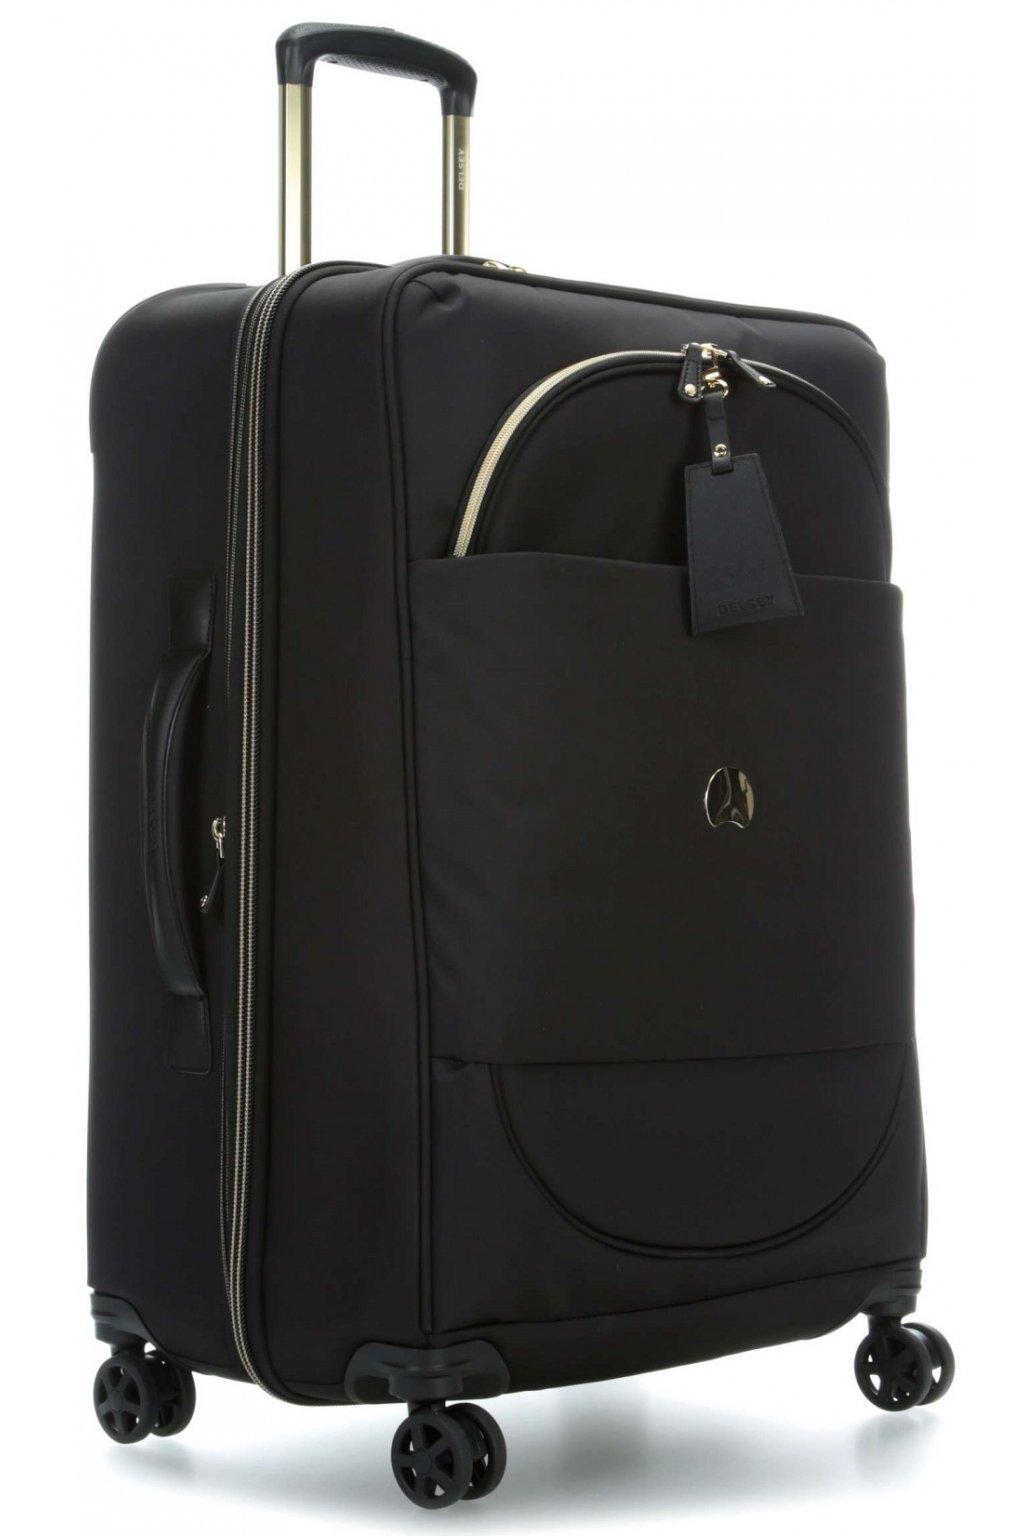 kufrland delsey montrouge valise black (2)